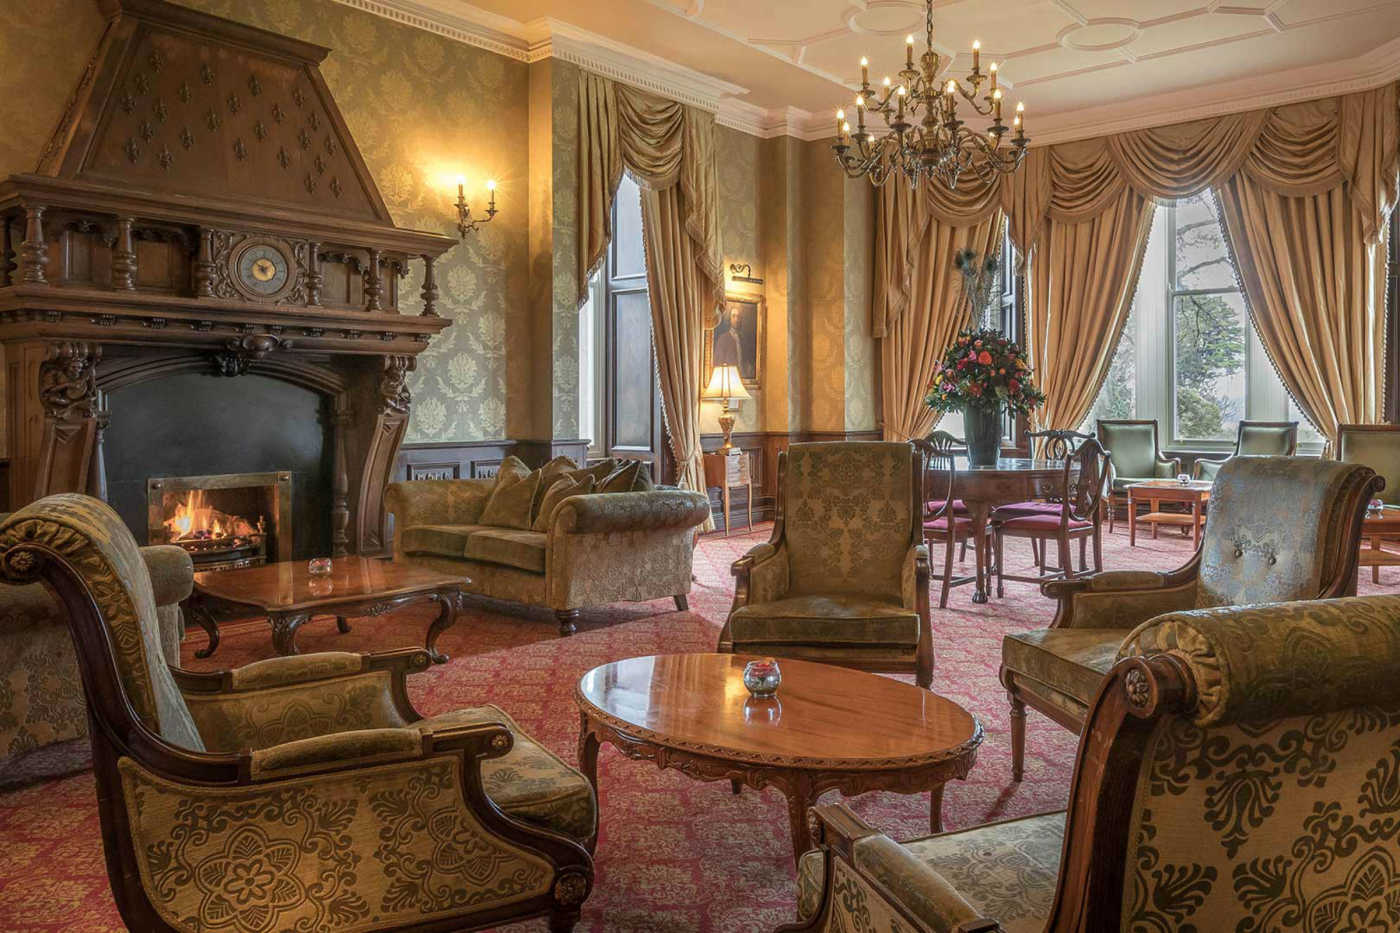 kilronan castle estate & spa roscommon ireland